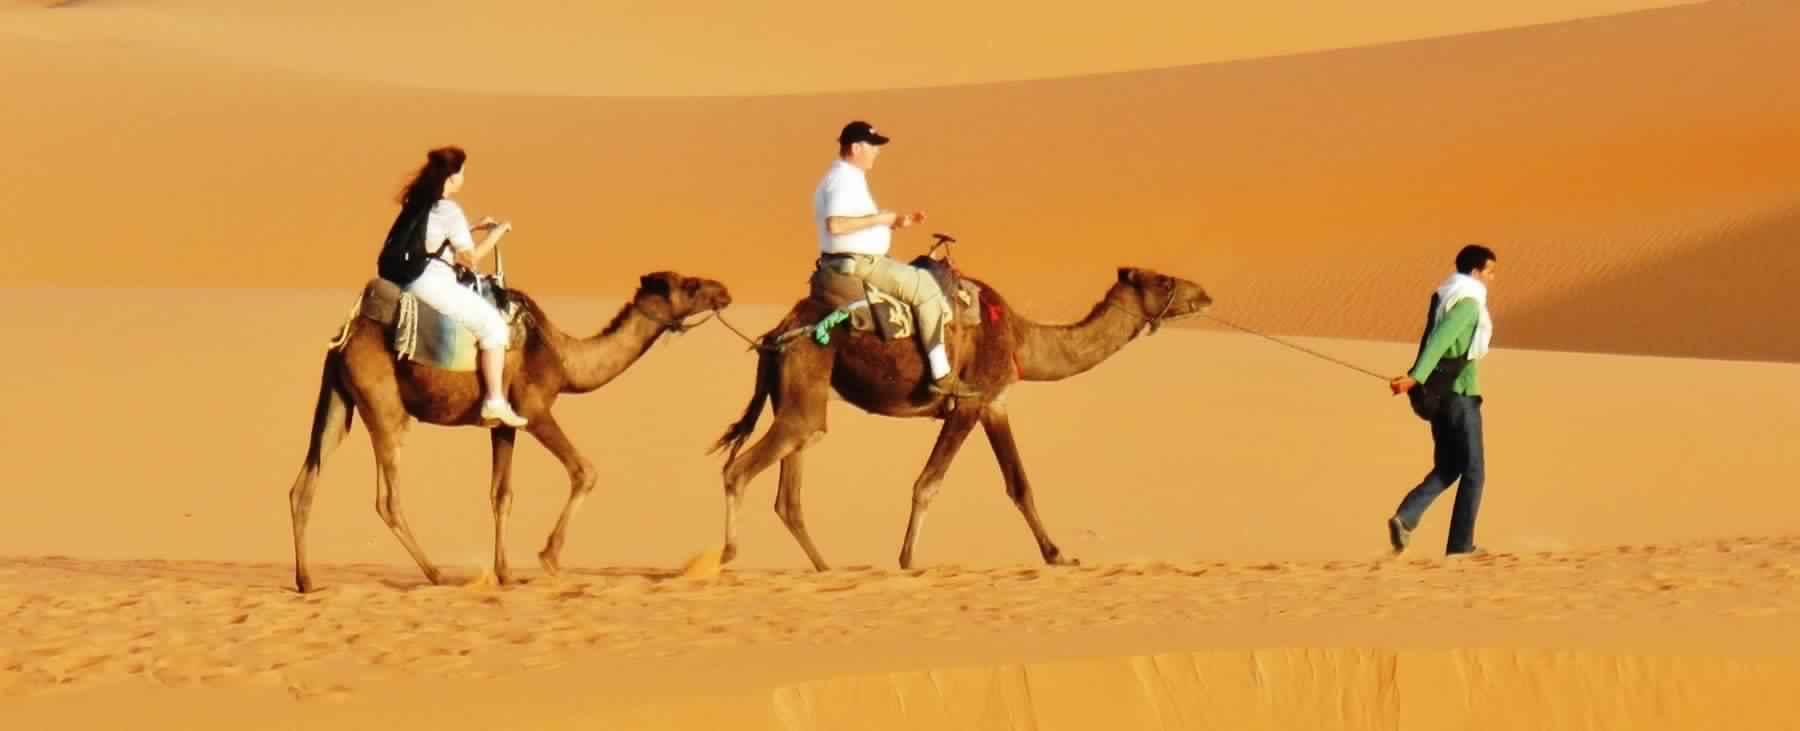 Dubai Desert Safari Tour- Camel Riding & Dune Bashing